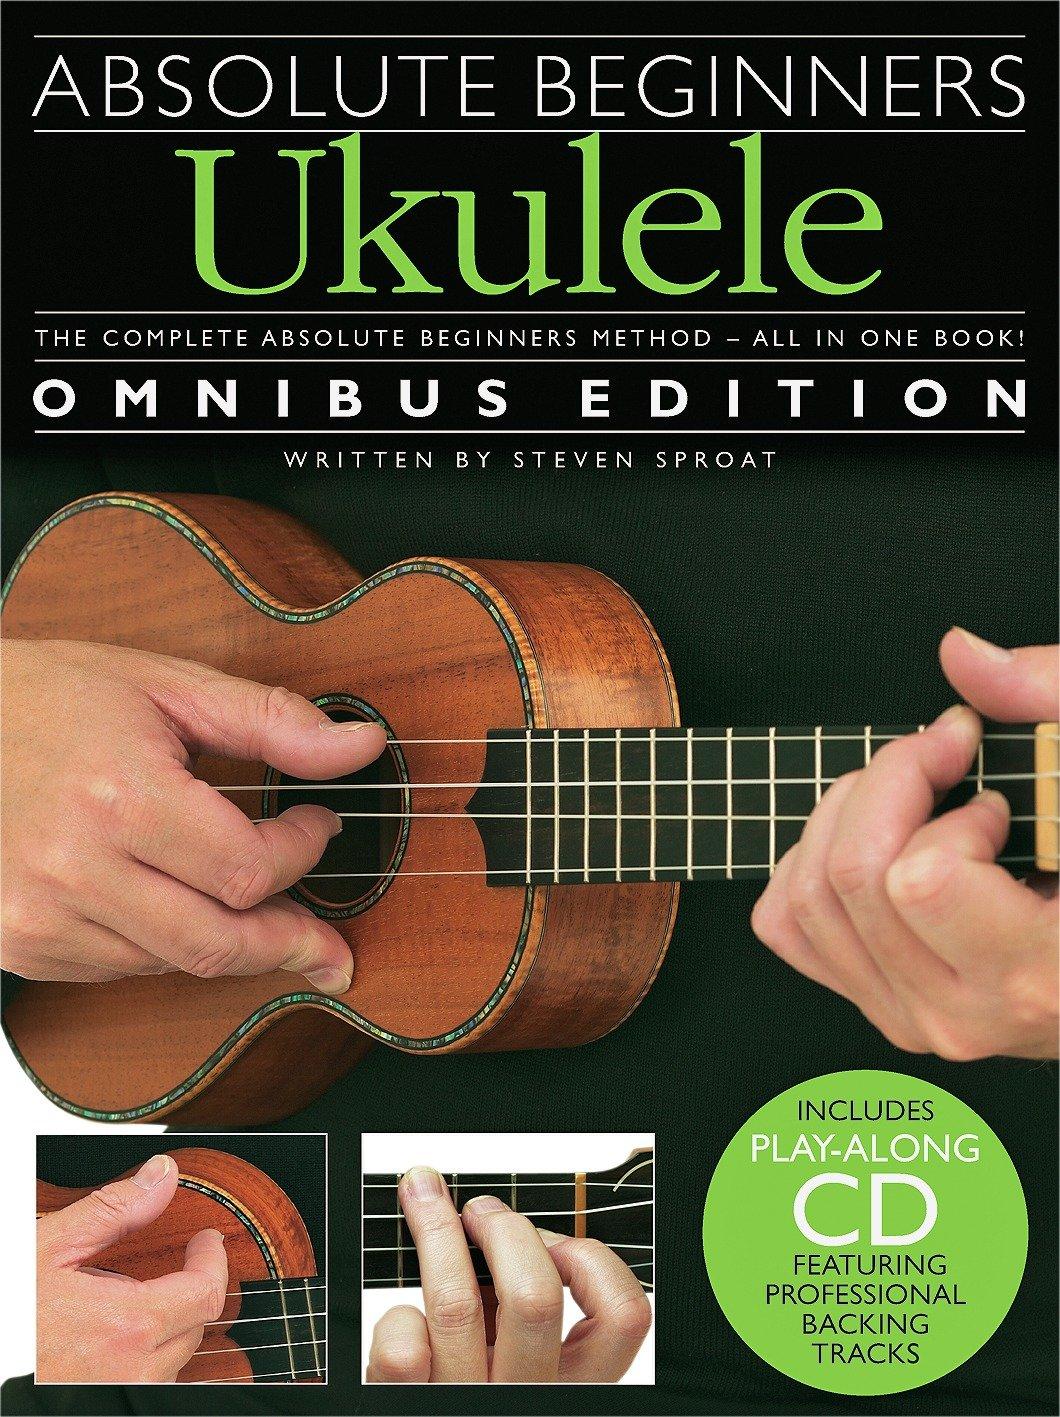 Absolute Beginners Ukulele - Omnibus Edition